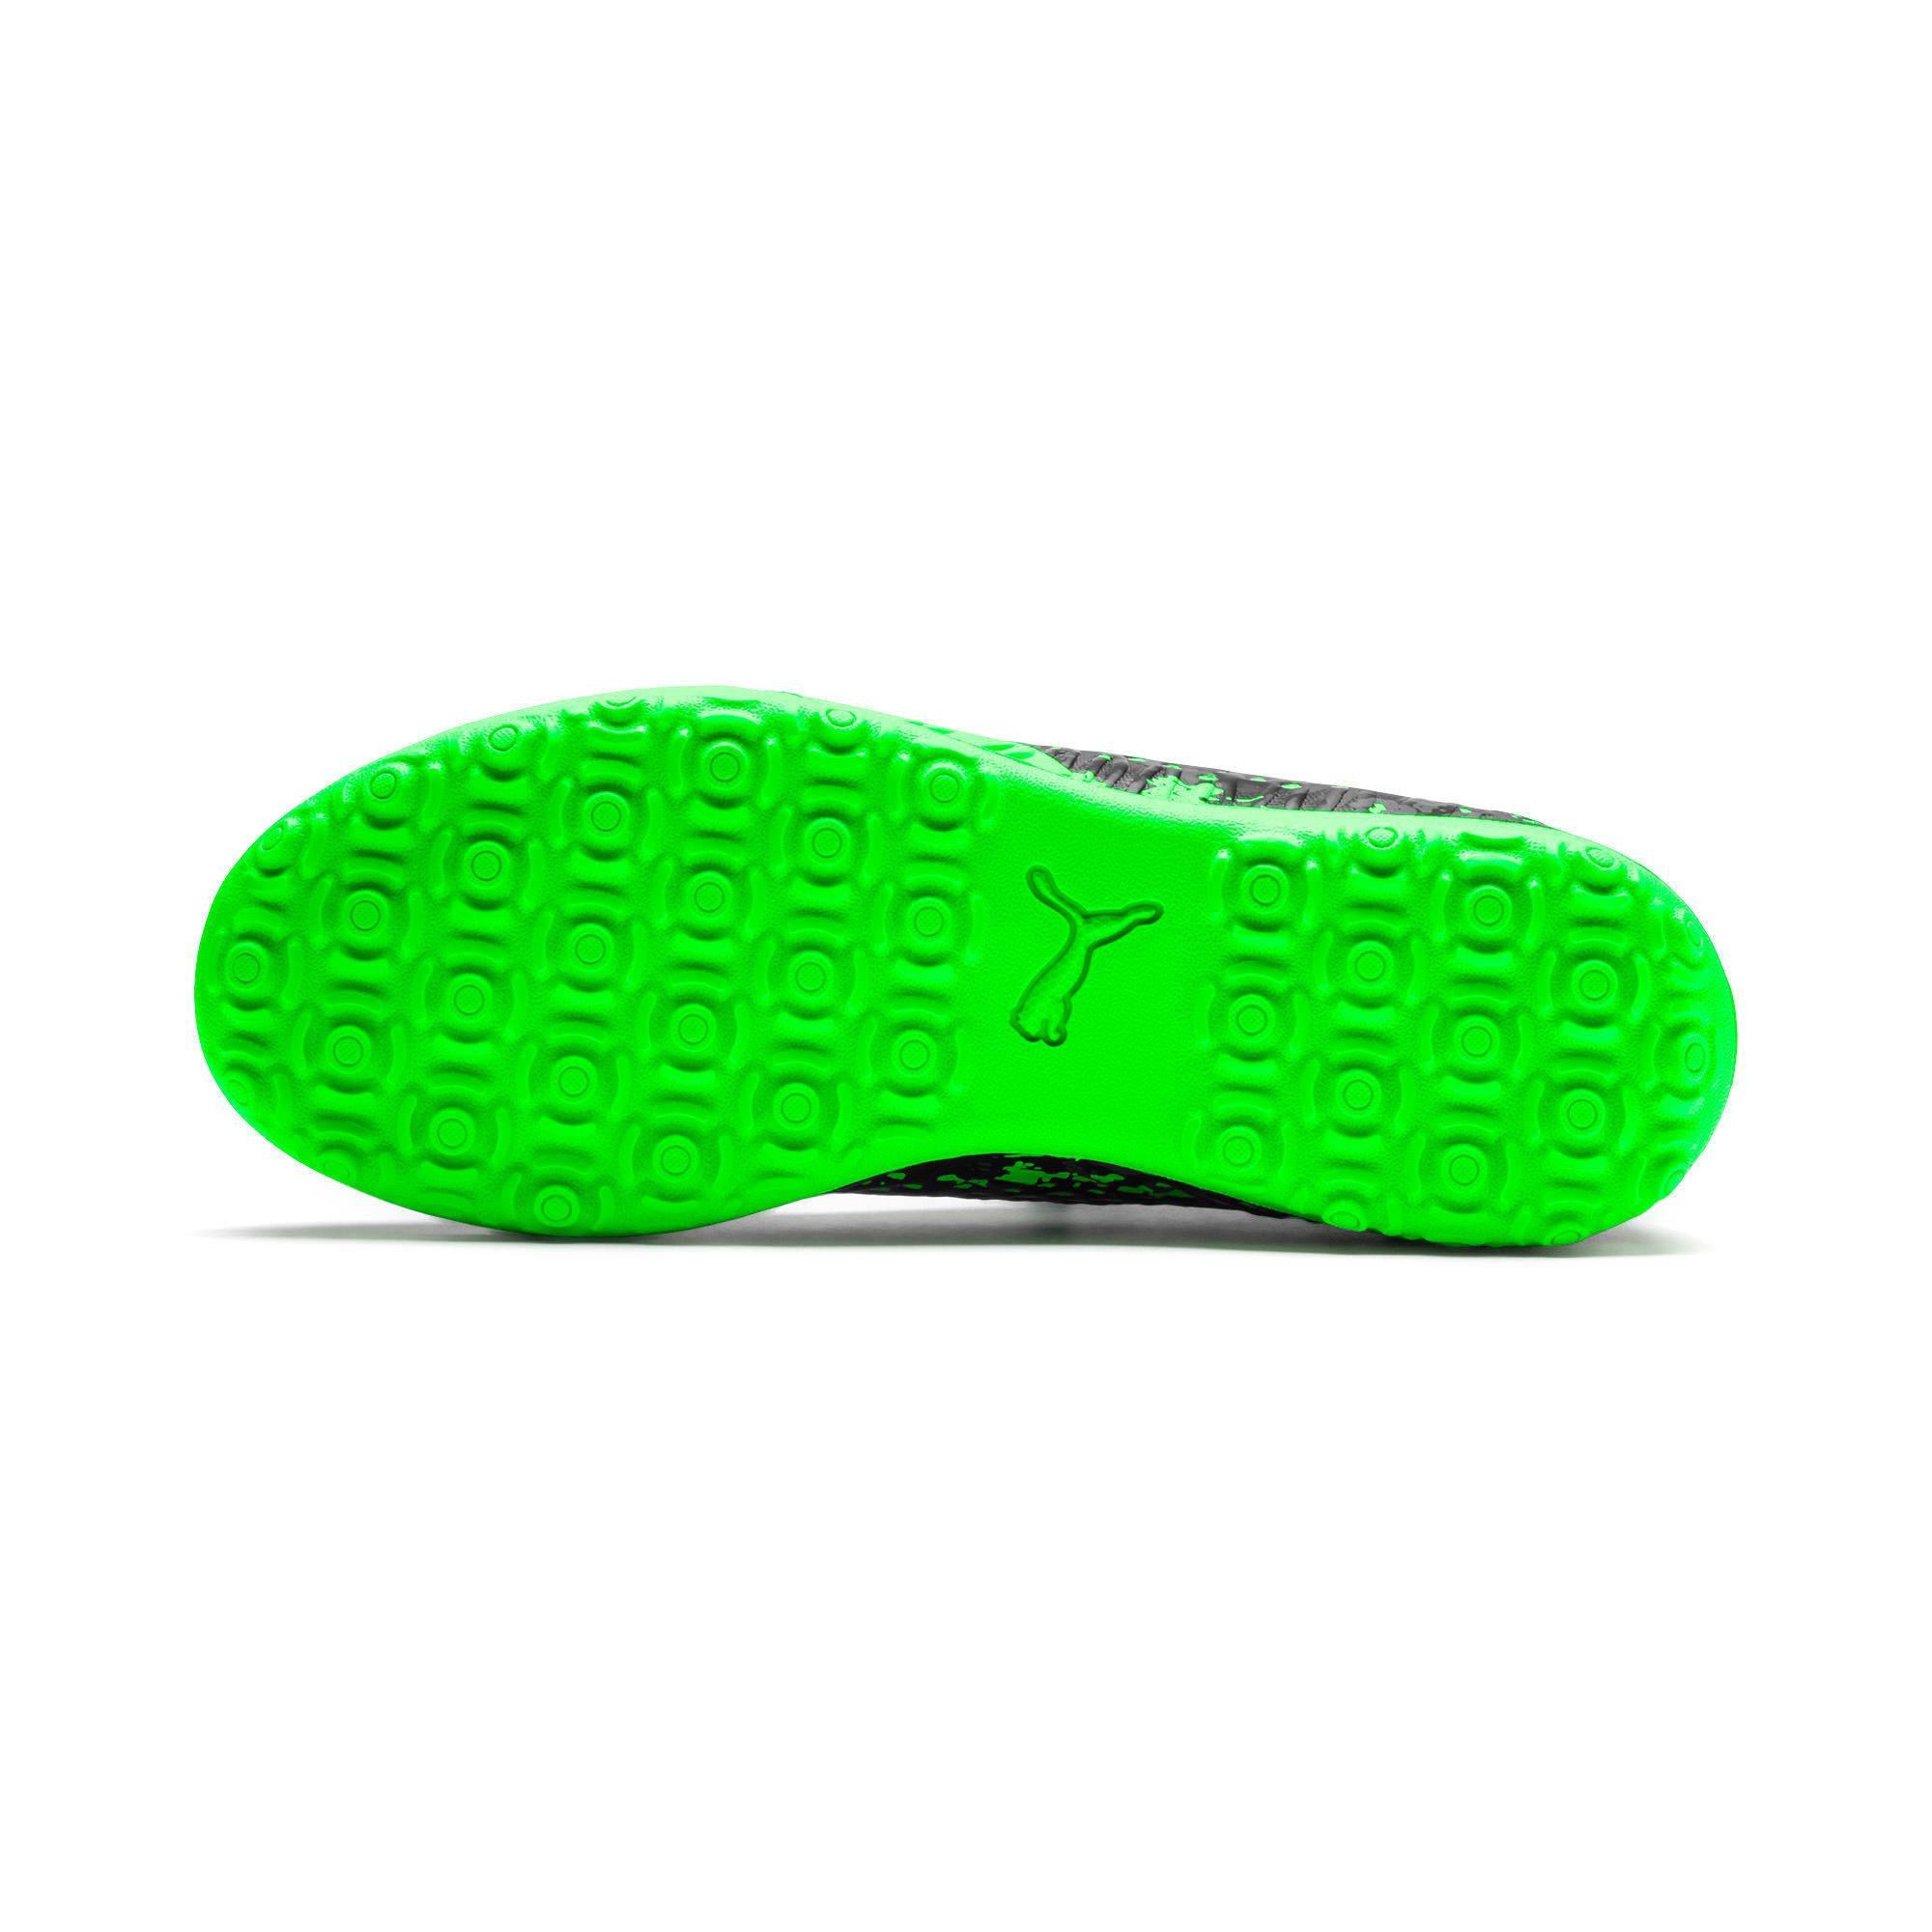 Thumbnail 4 of FUTURE 19.4 TT Youth Football Boots, Black-Gray-Green Gecko, medium